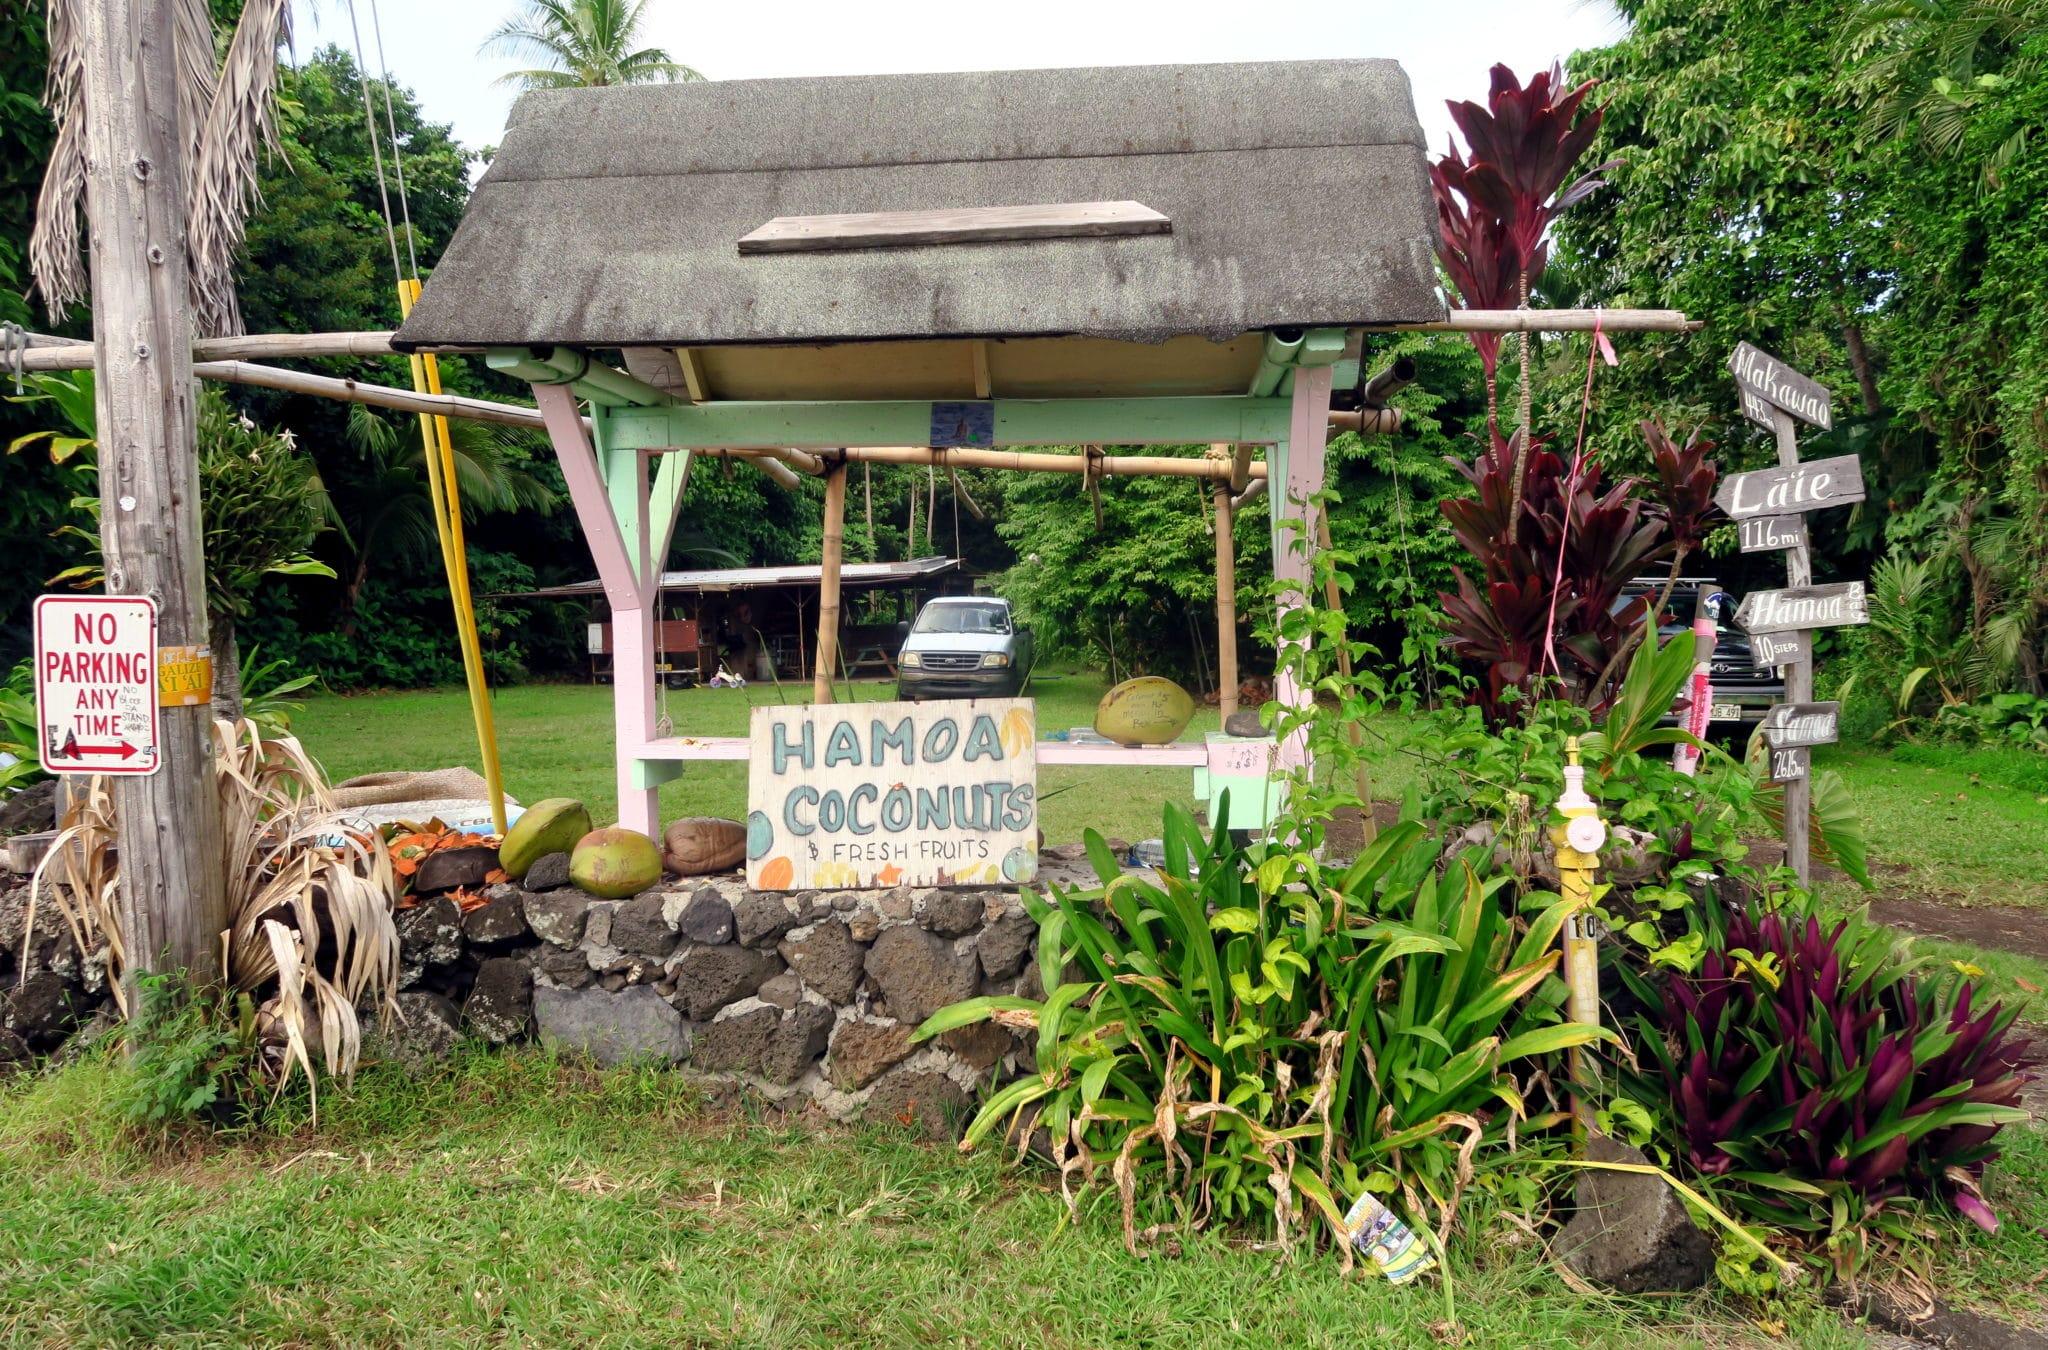 Hamoa Road to Hana Maui Hawaii